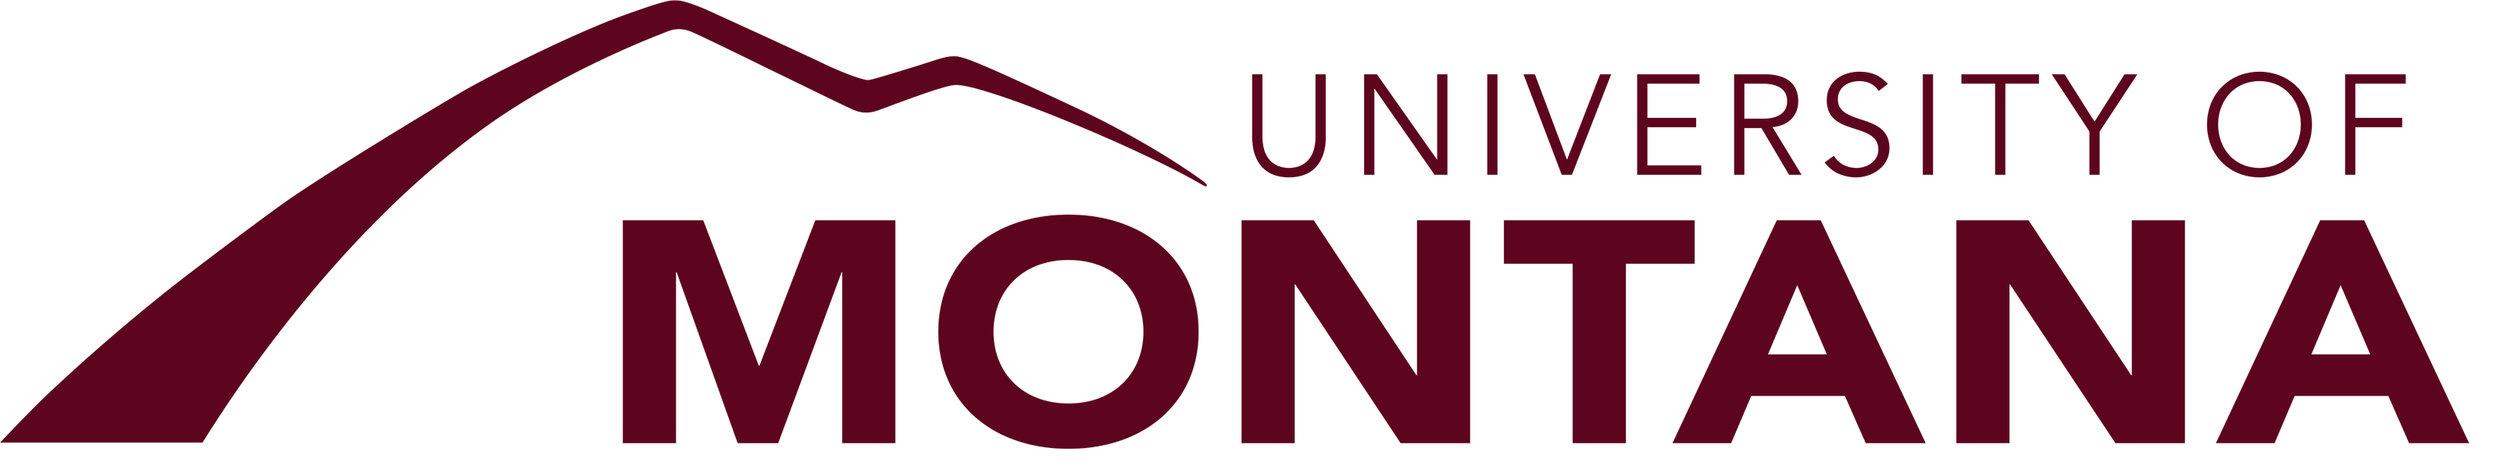 University of Montana Logo